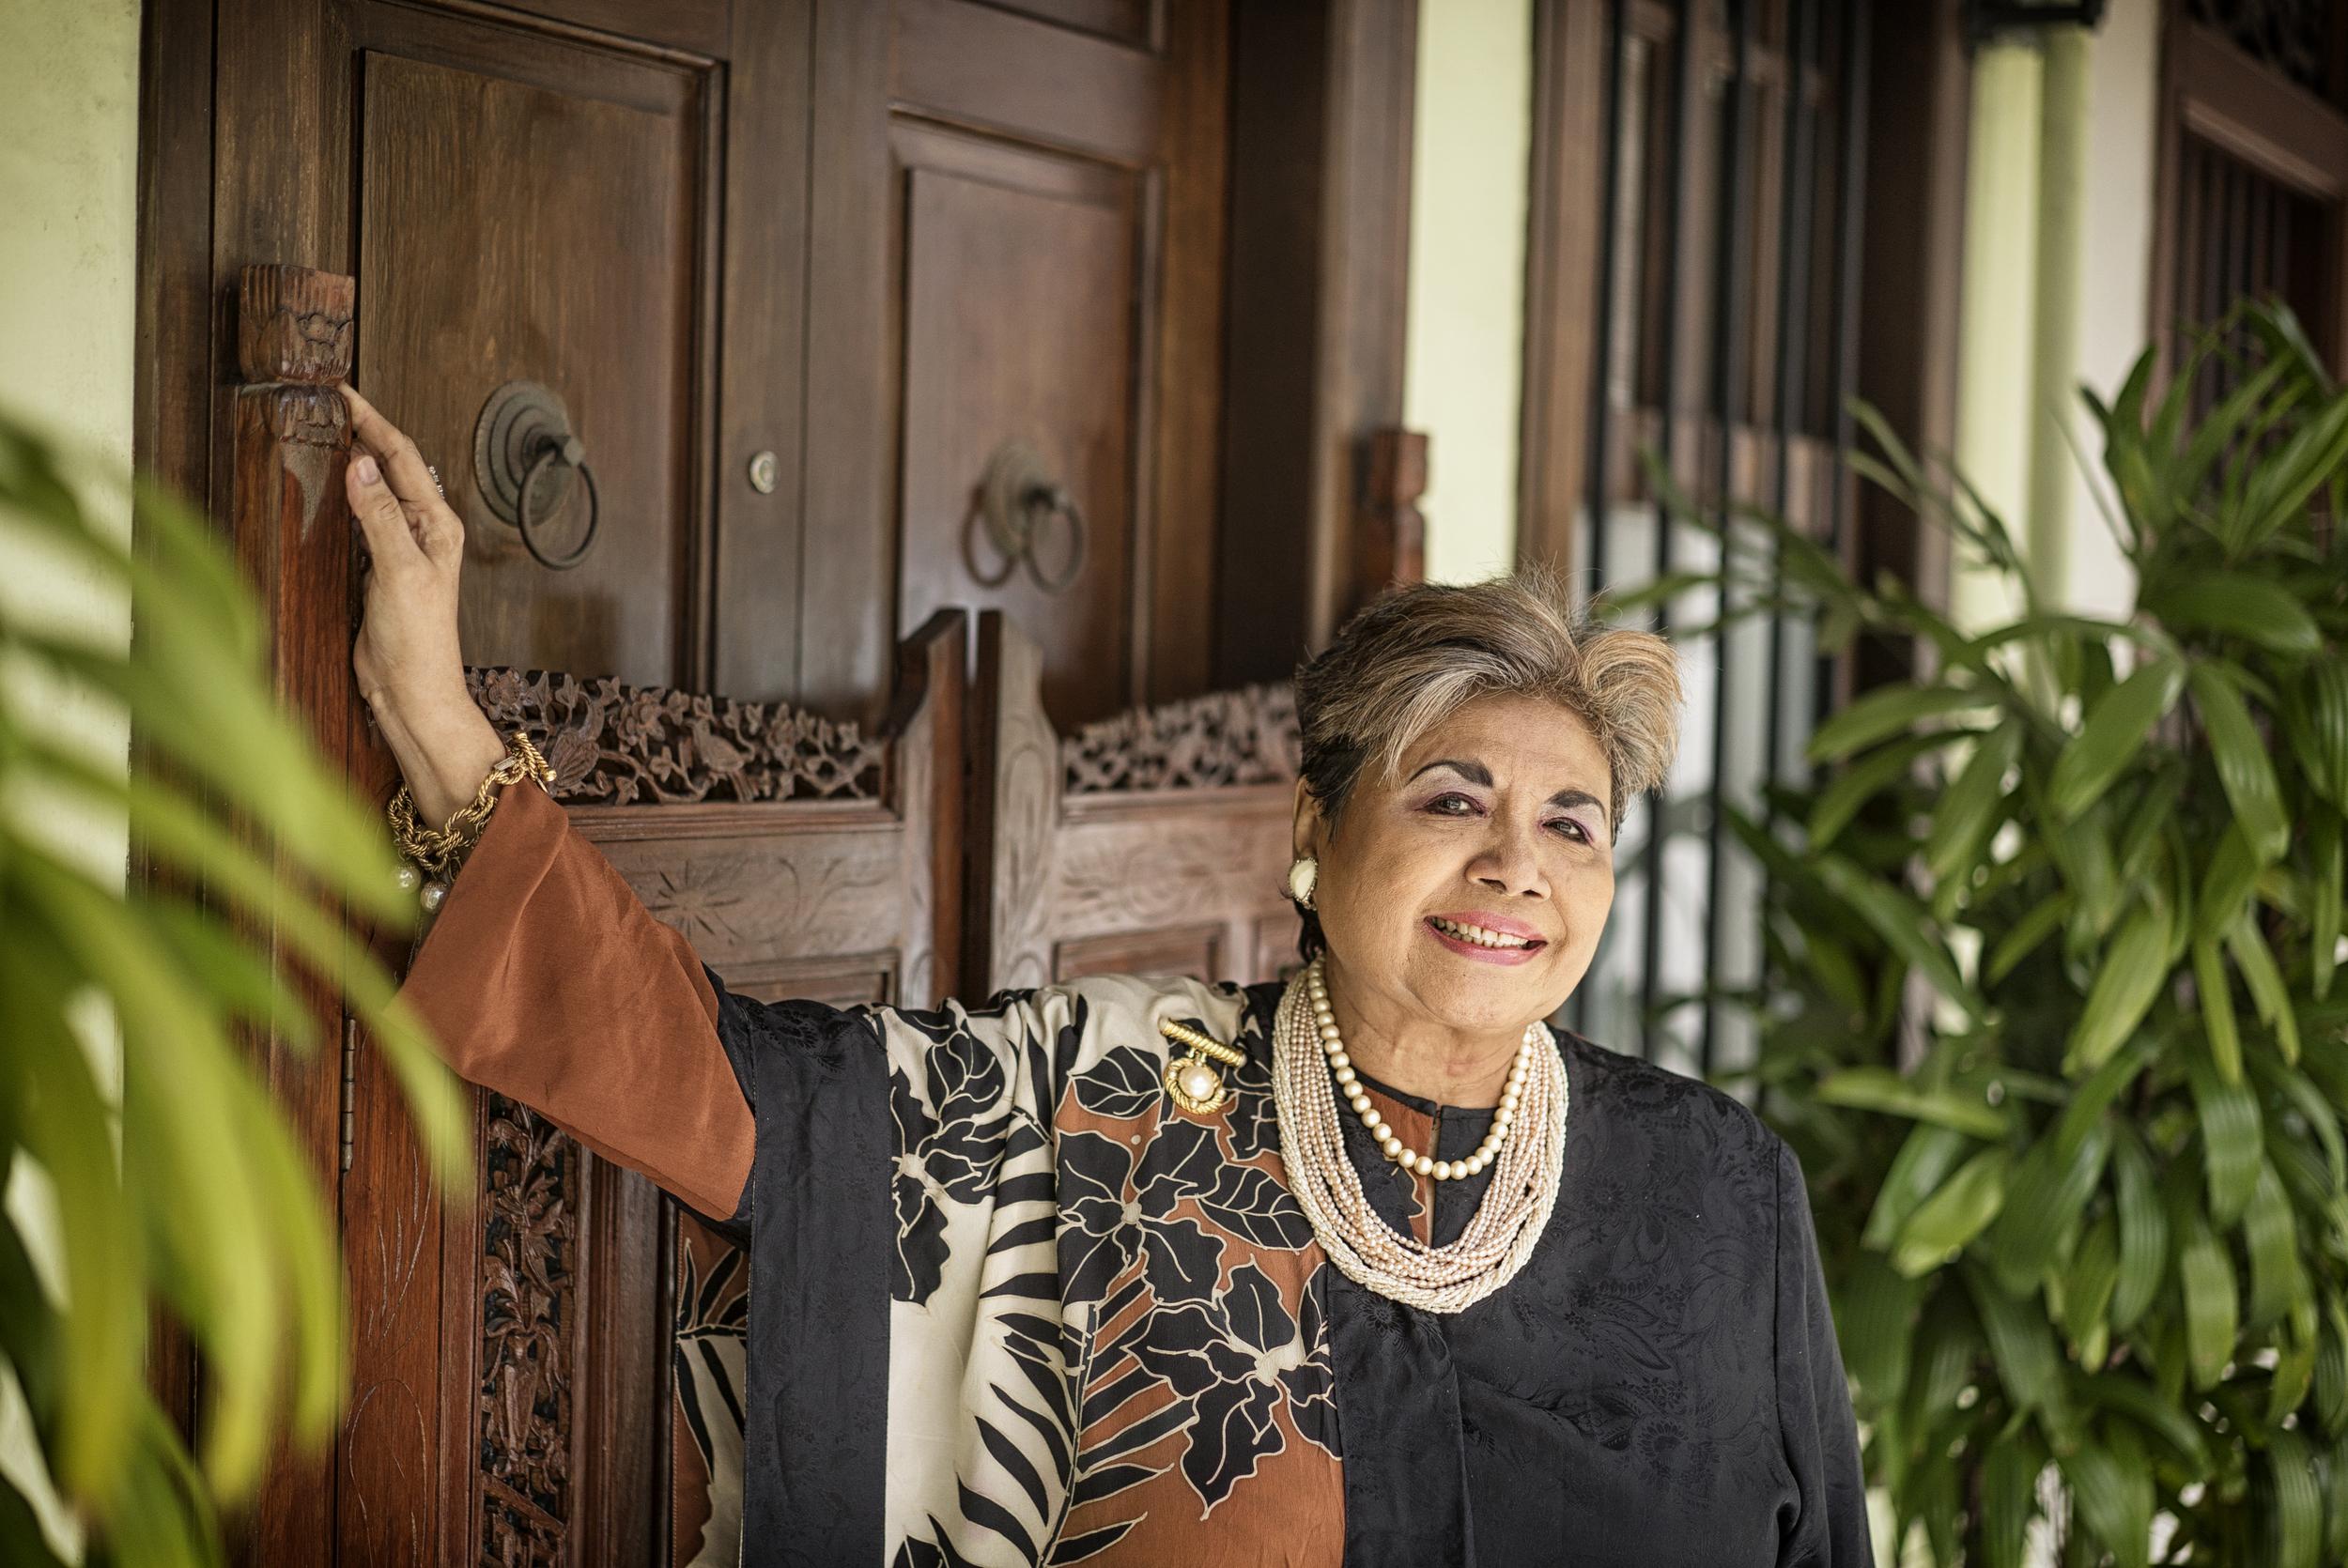 Aziza Ali opened Singapore's first fine-dining Malay restaurant Aziza's, on Emerald Hill.